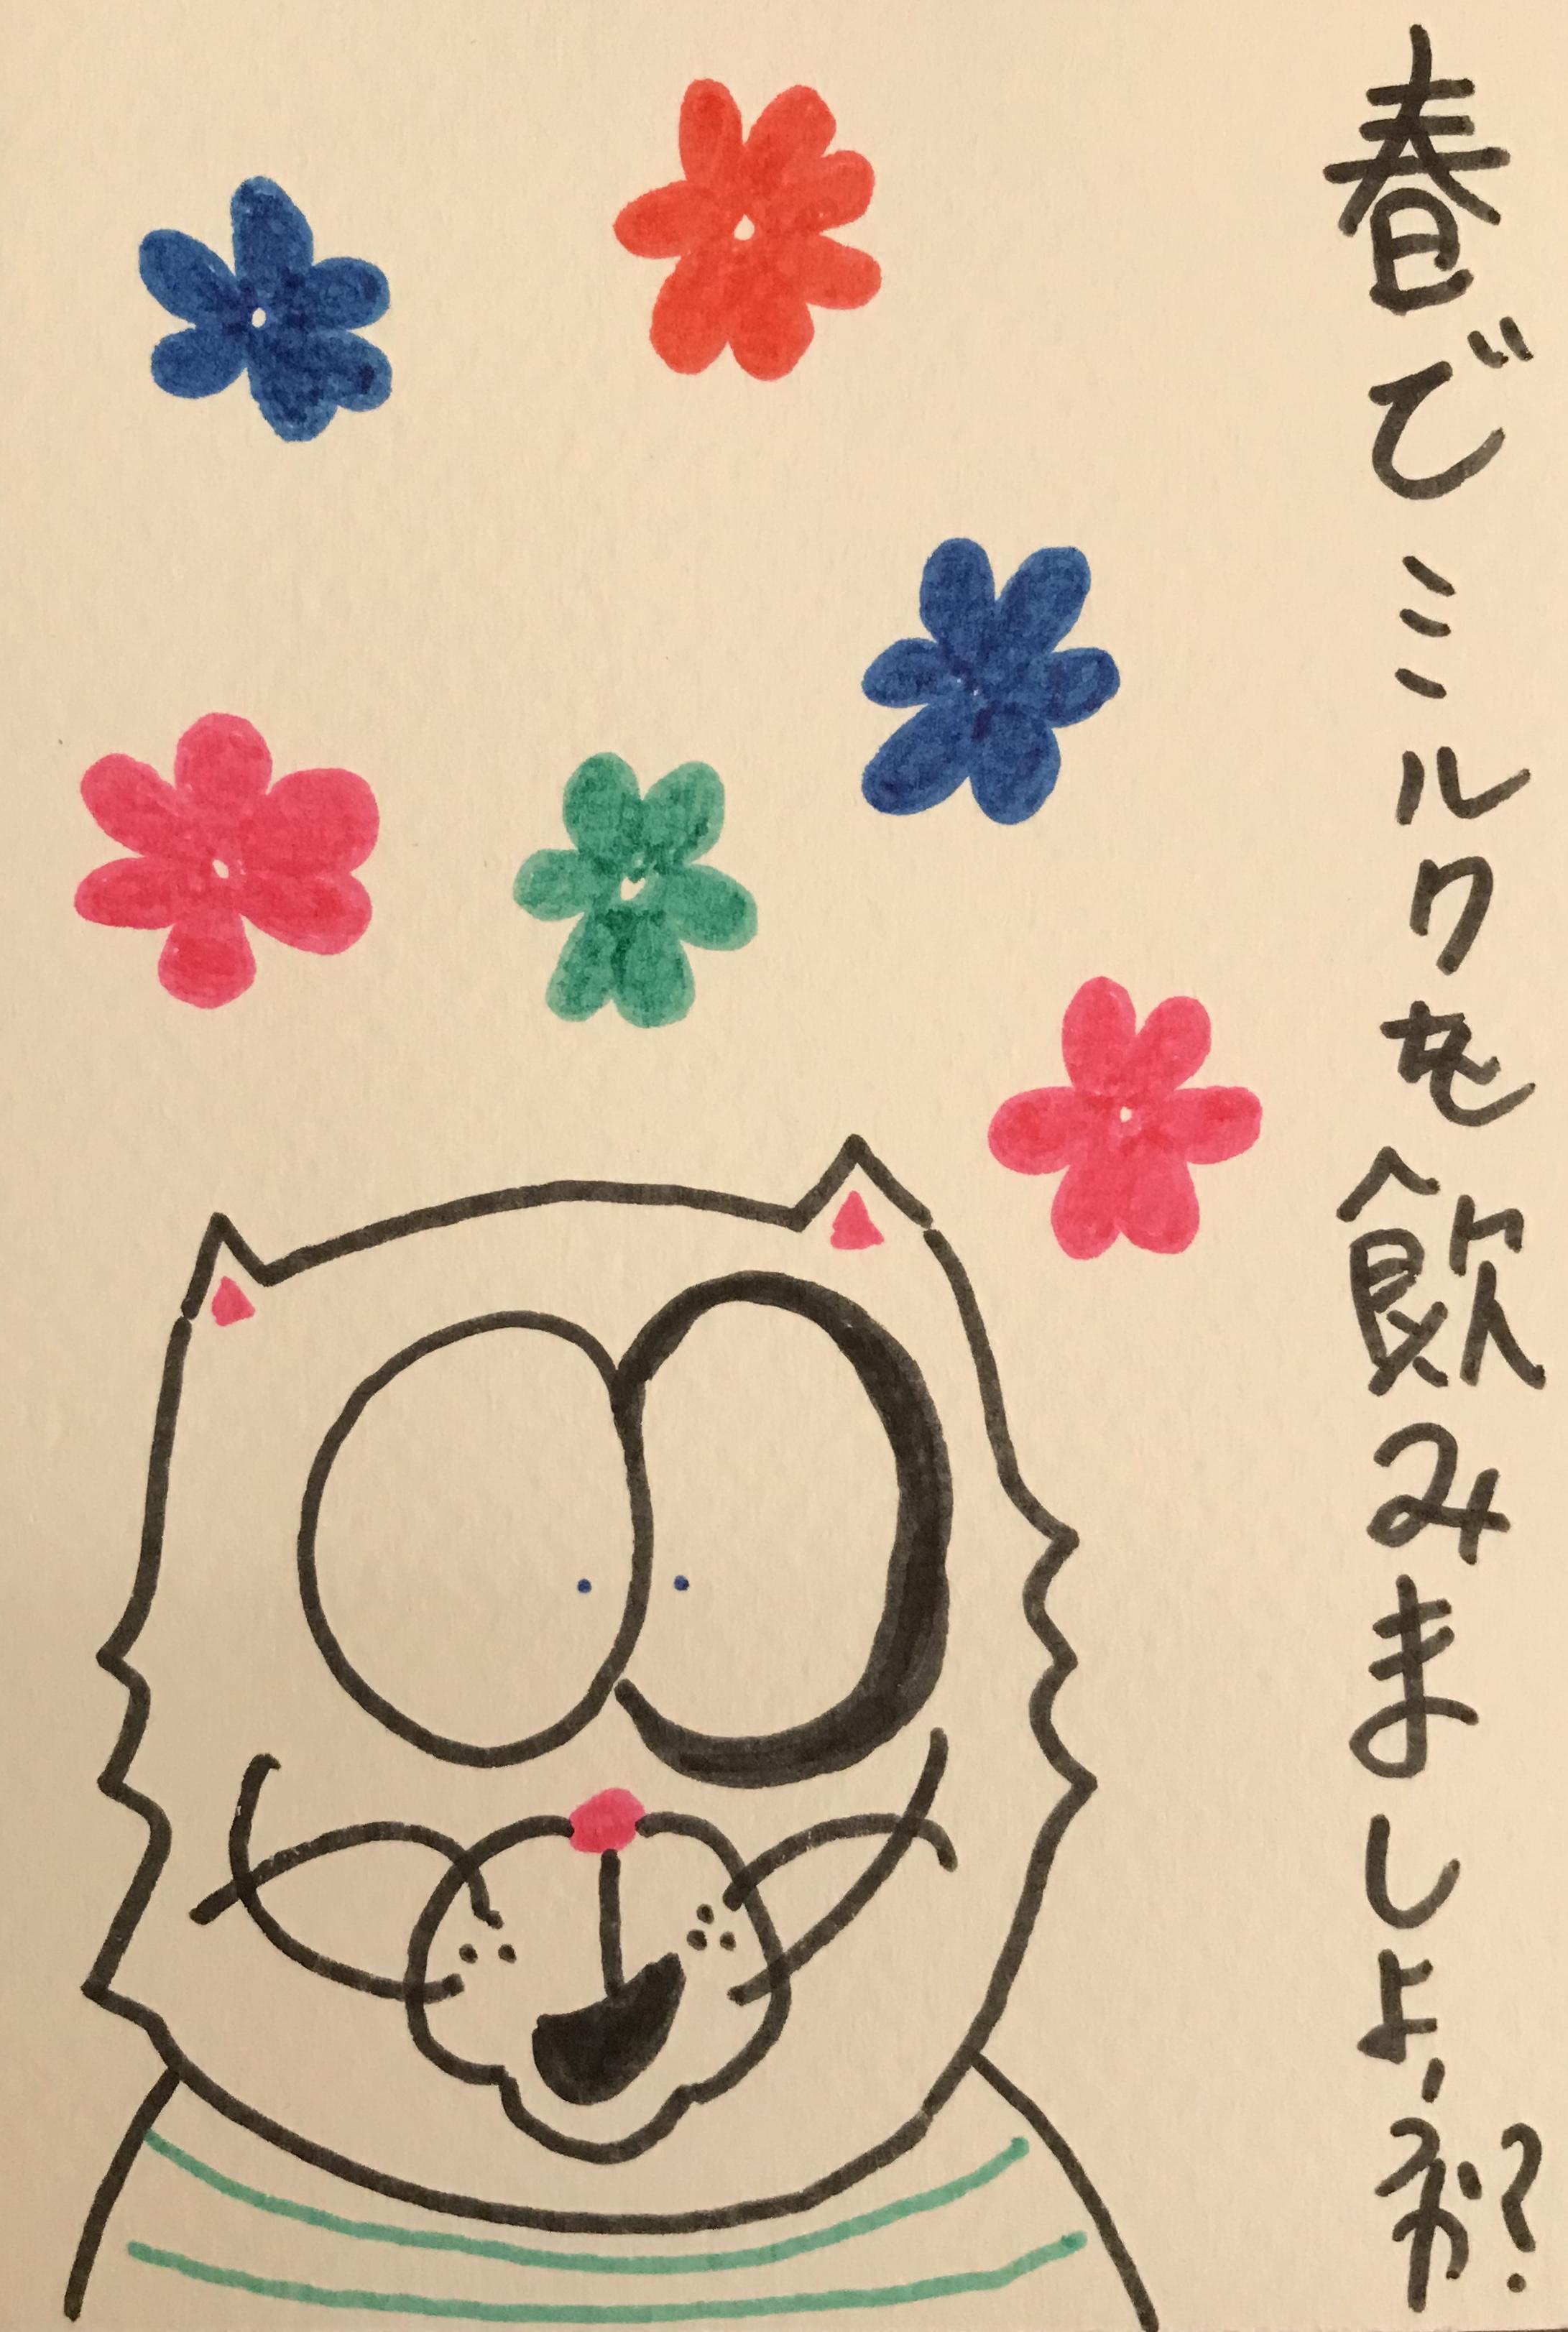 Flowery Kitten Do you drink miylk in spring